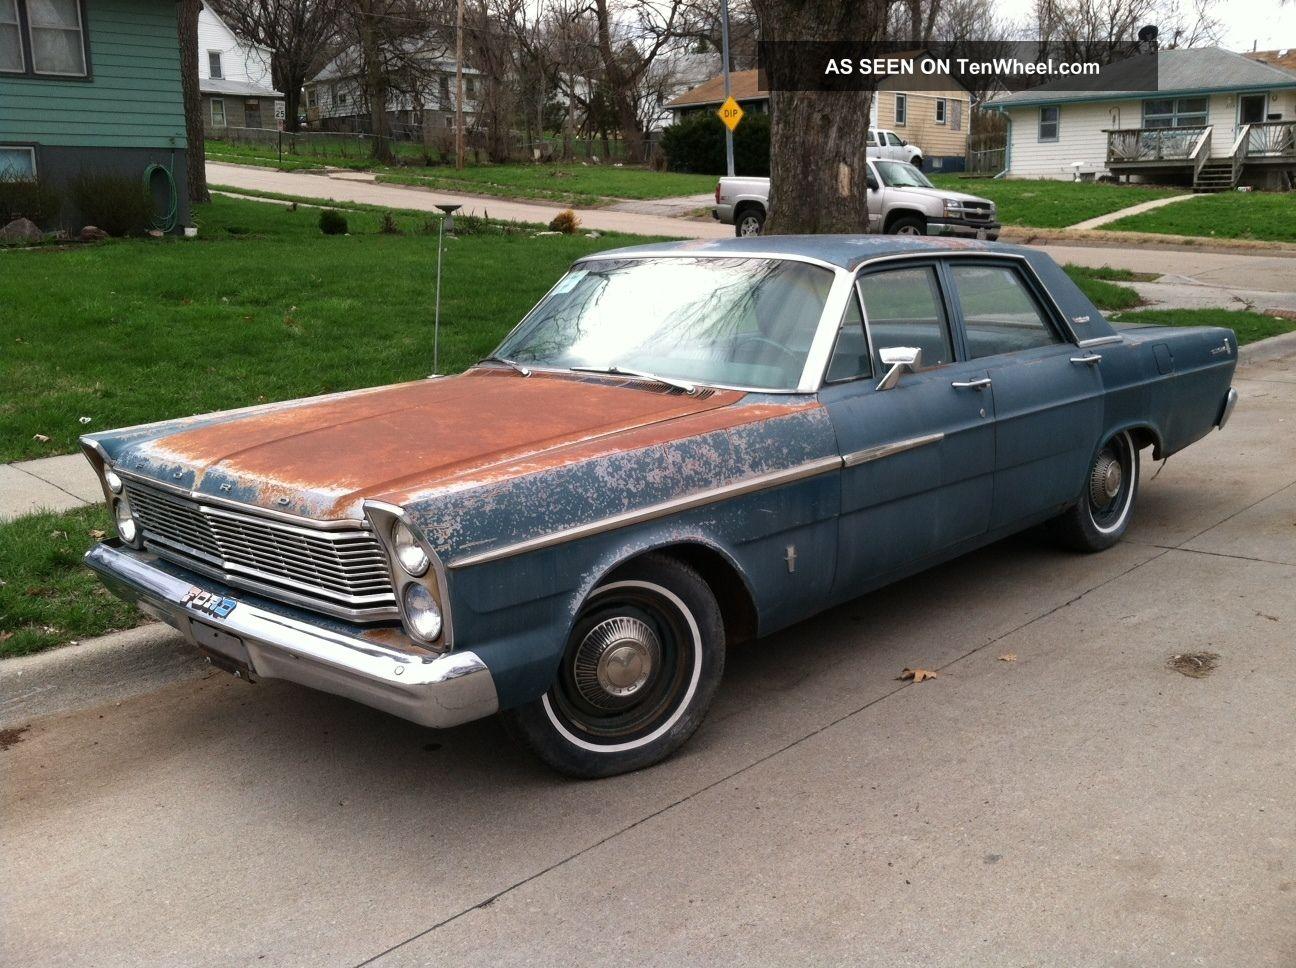 1965 Ford Galaxie Custom - Just Like The